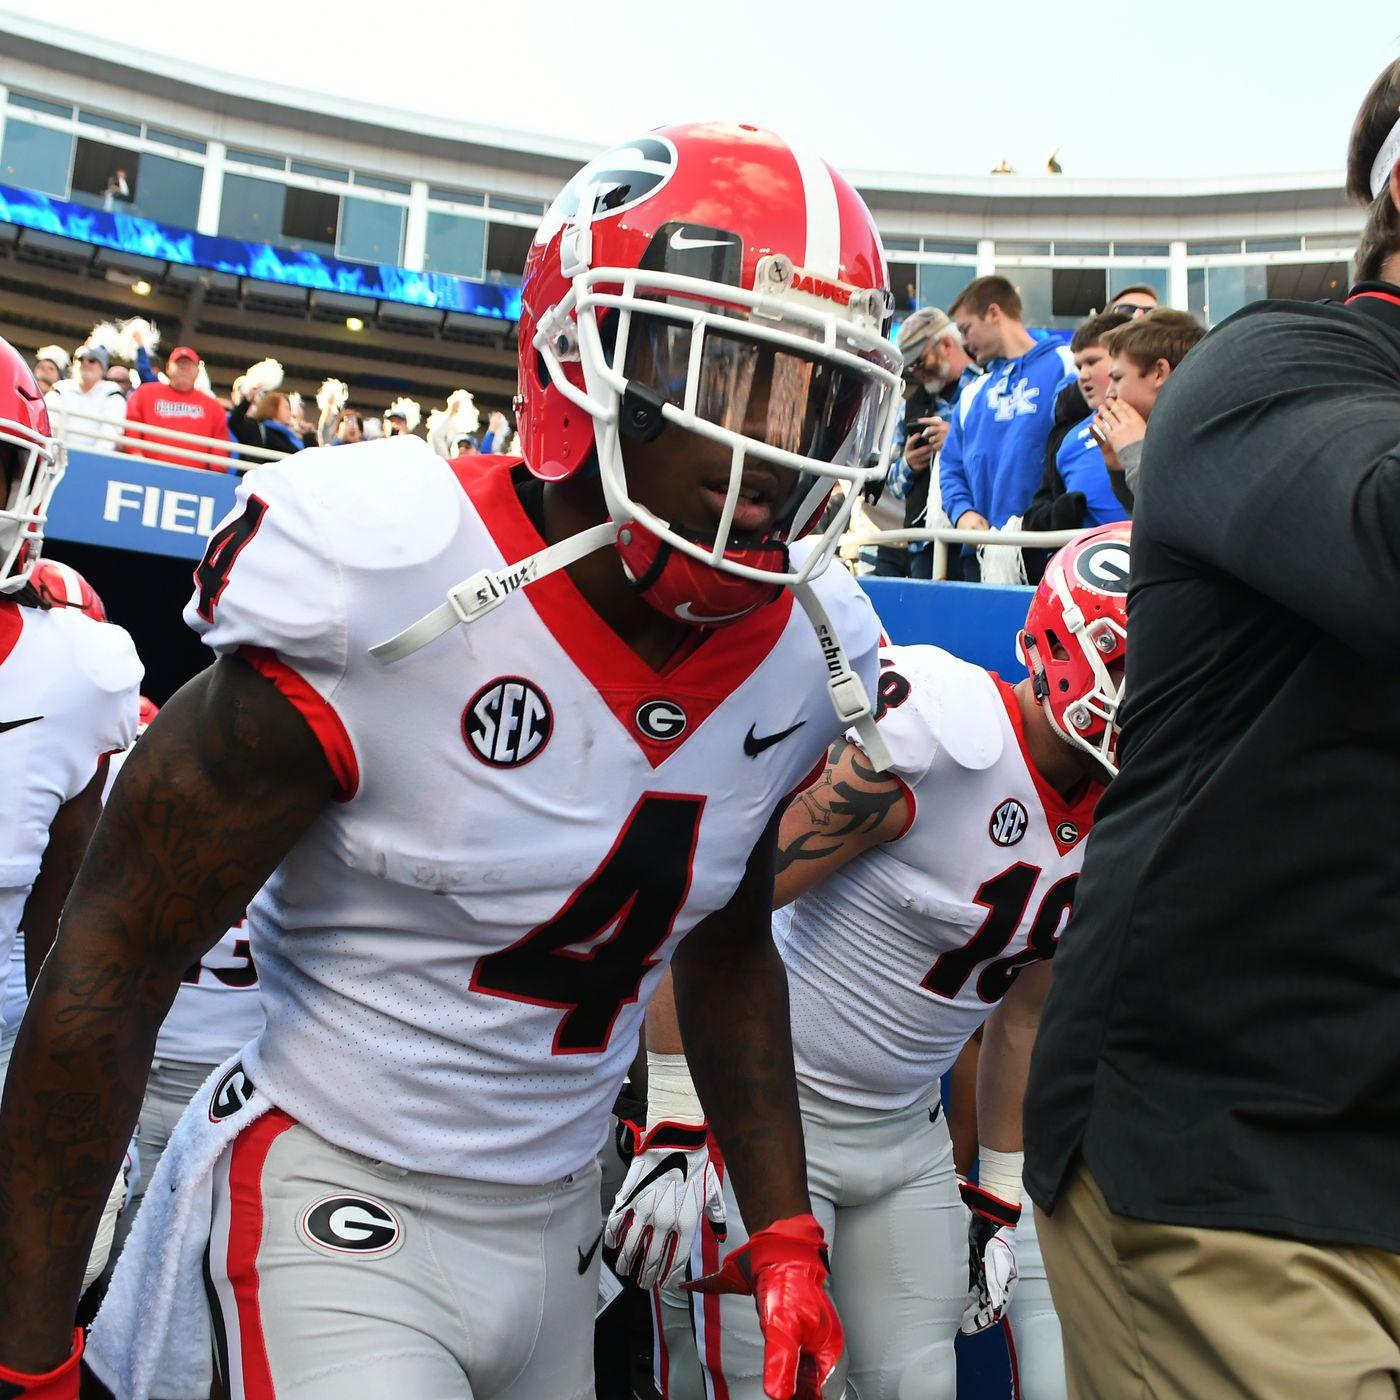 2019 SEC Football Season Preview: Georgia Bulldogs - Team Speed Kills